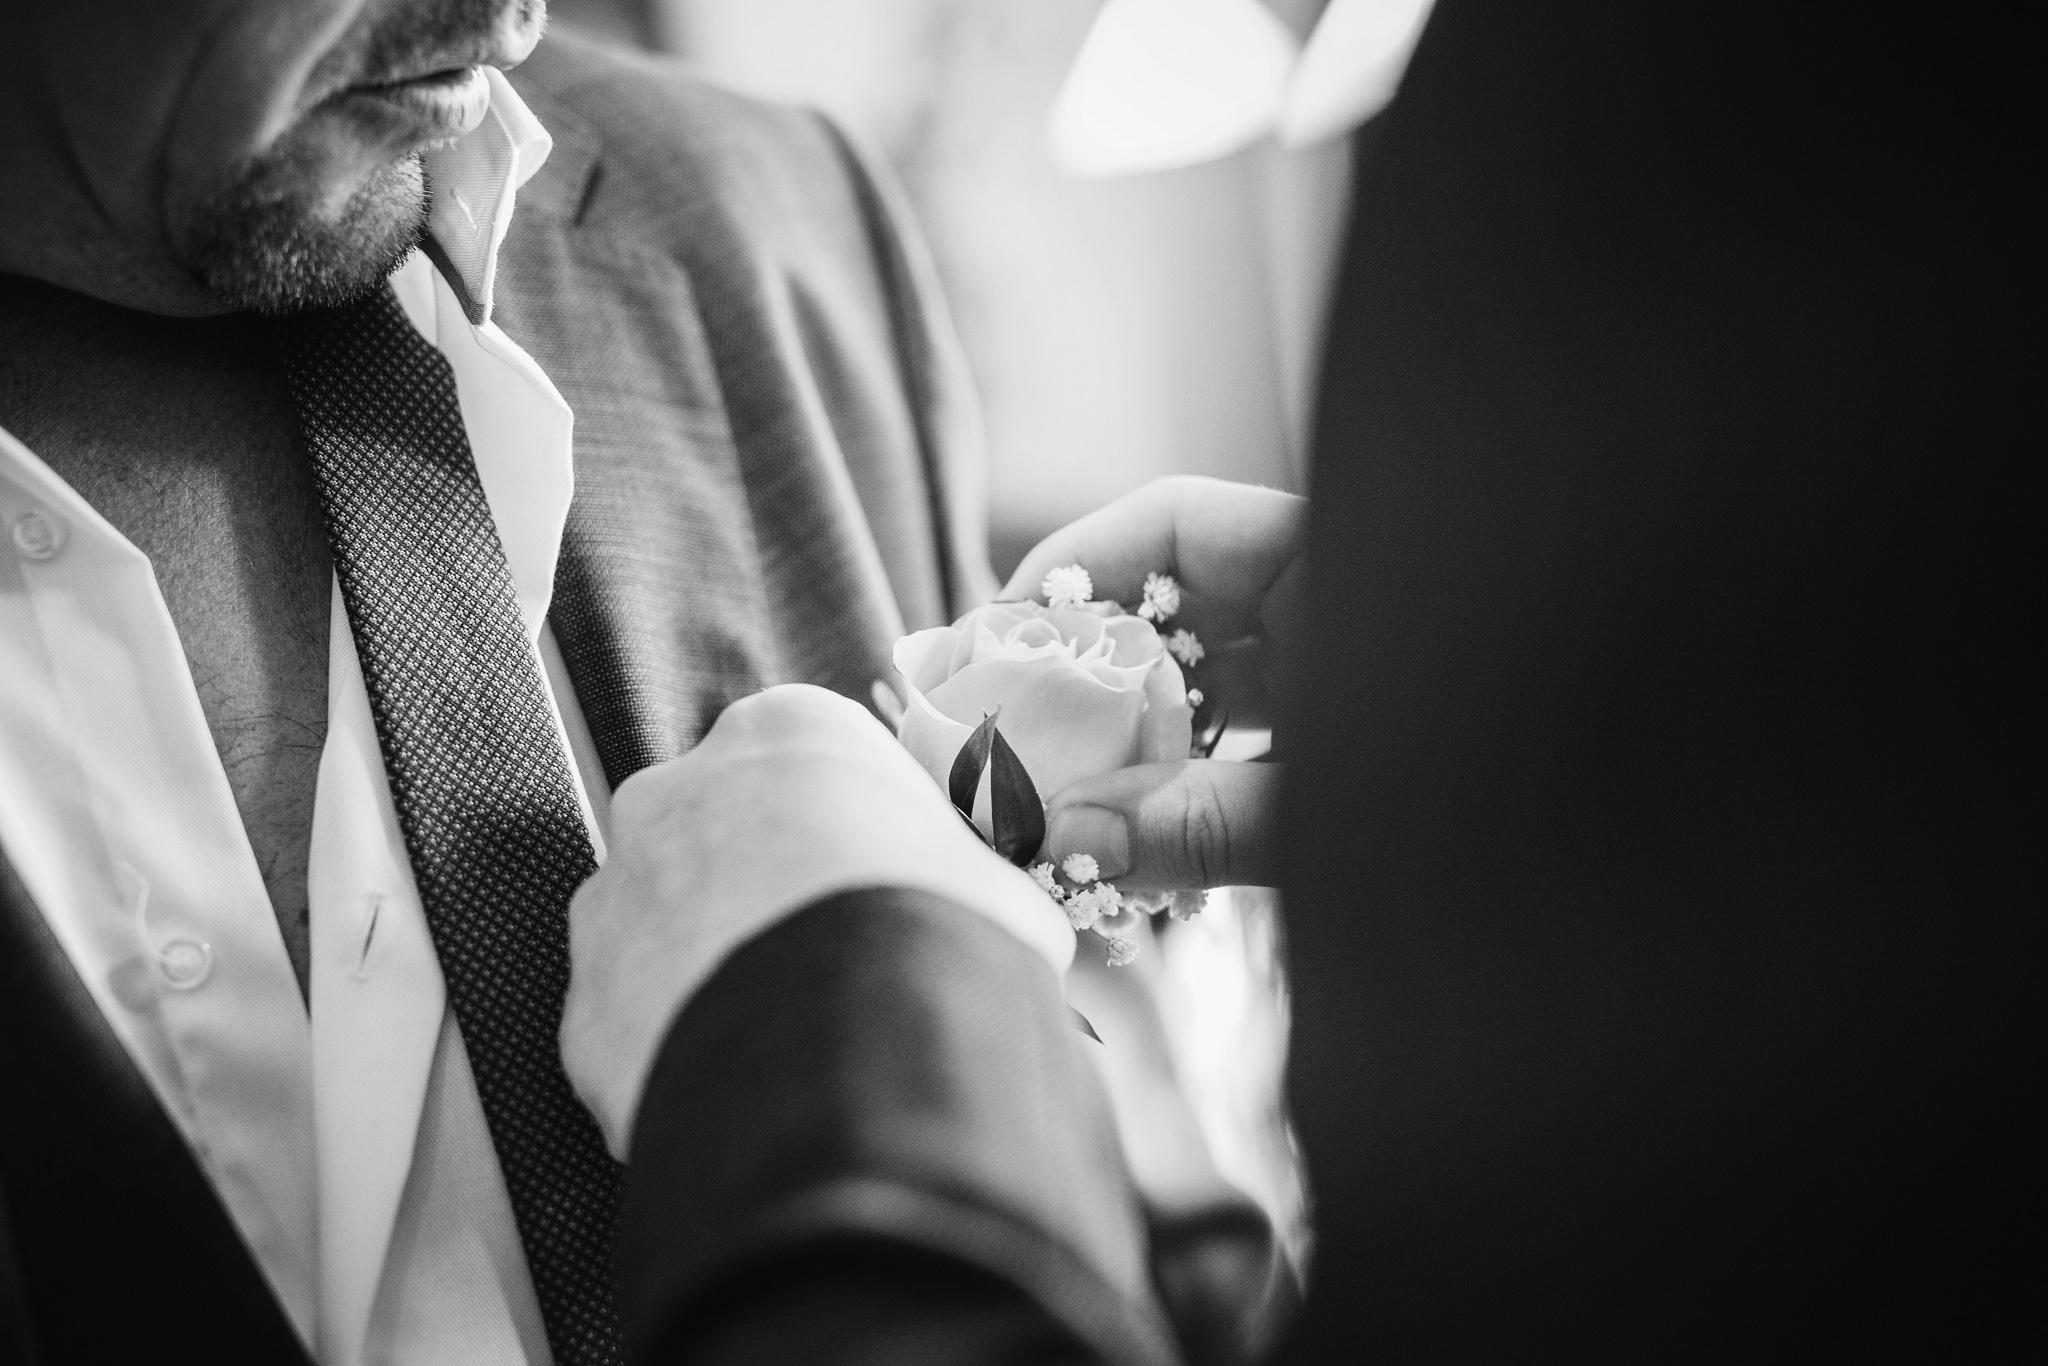 Norway+wedding+photographer+elopement+pre+wedding+Casey+Arneson-11.jpg